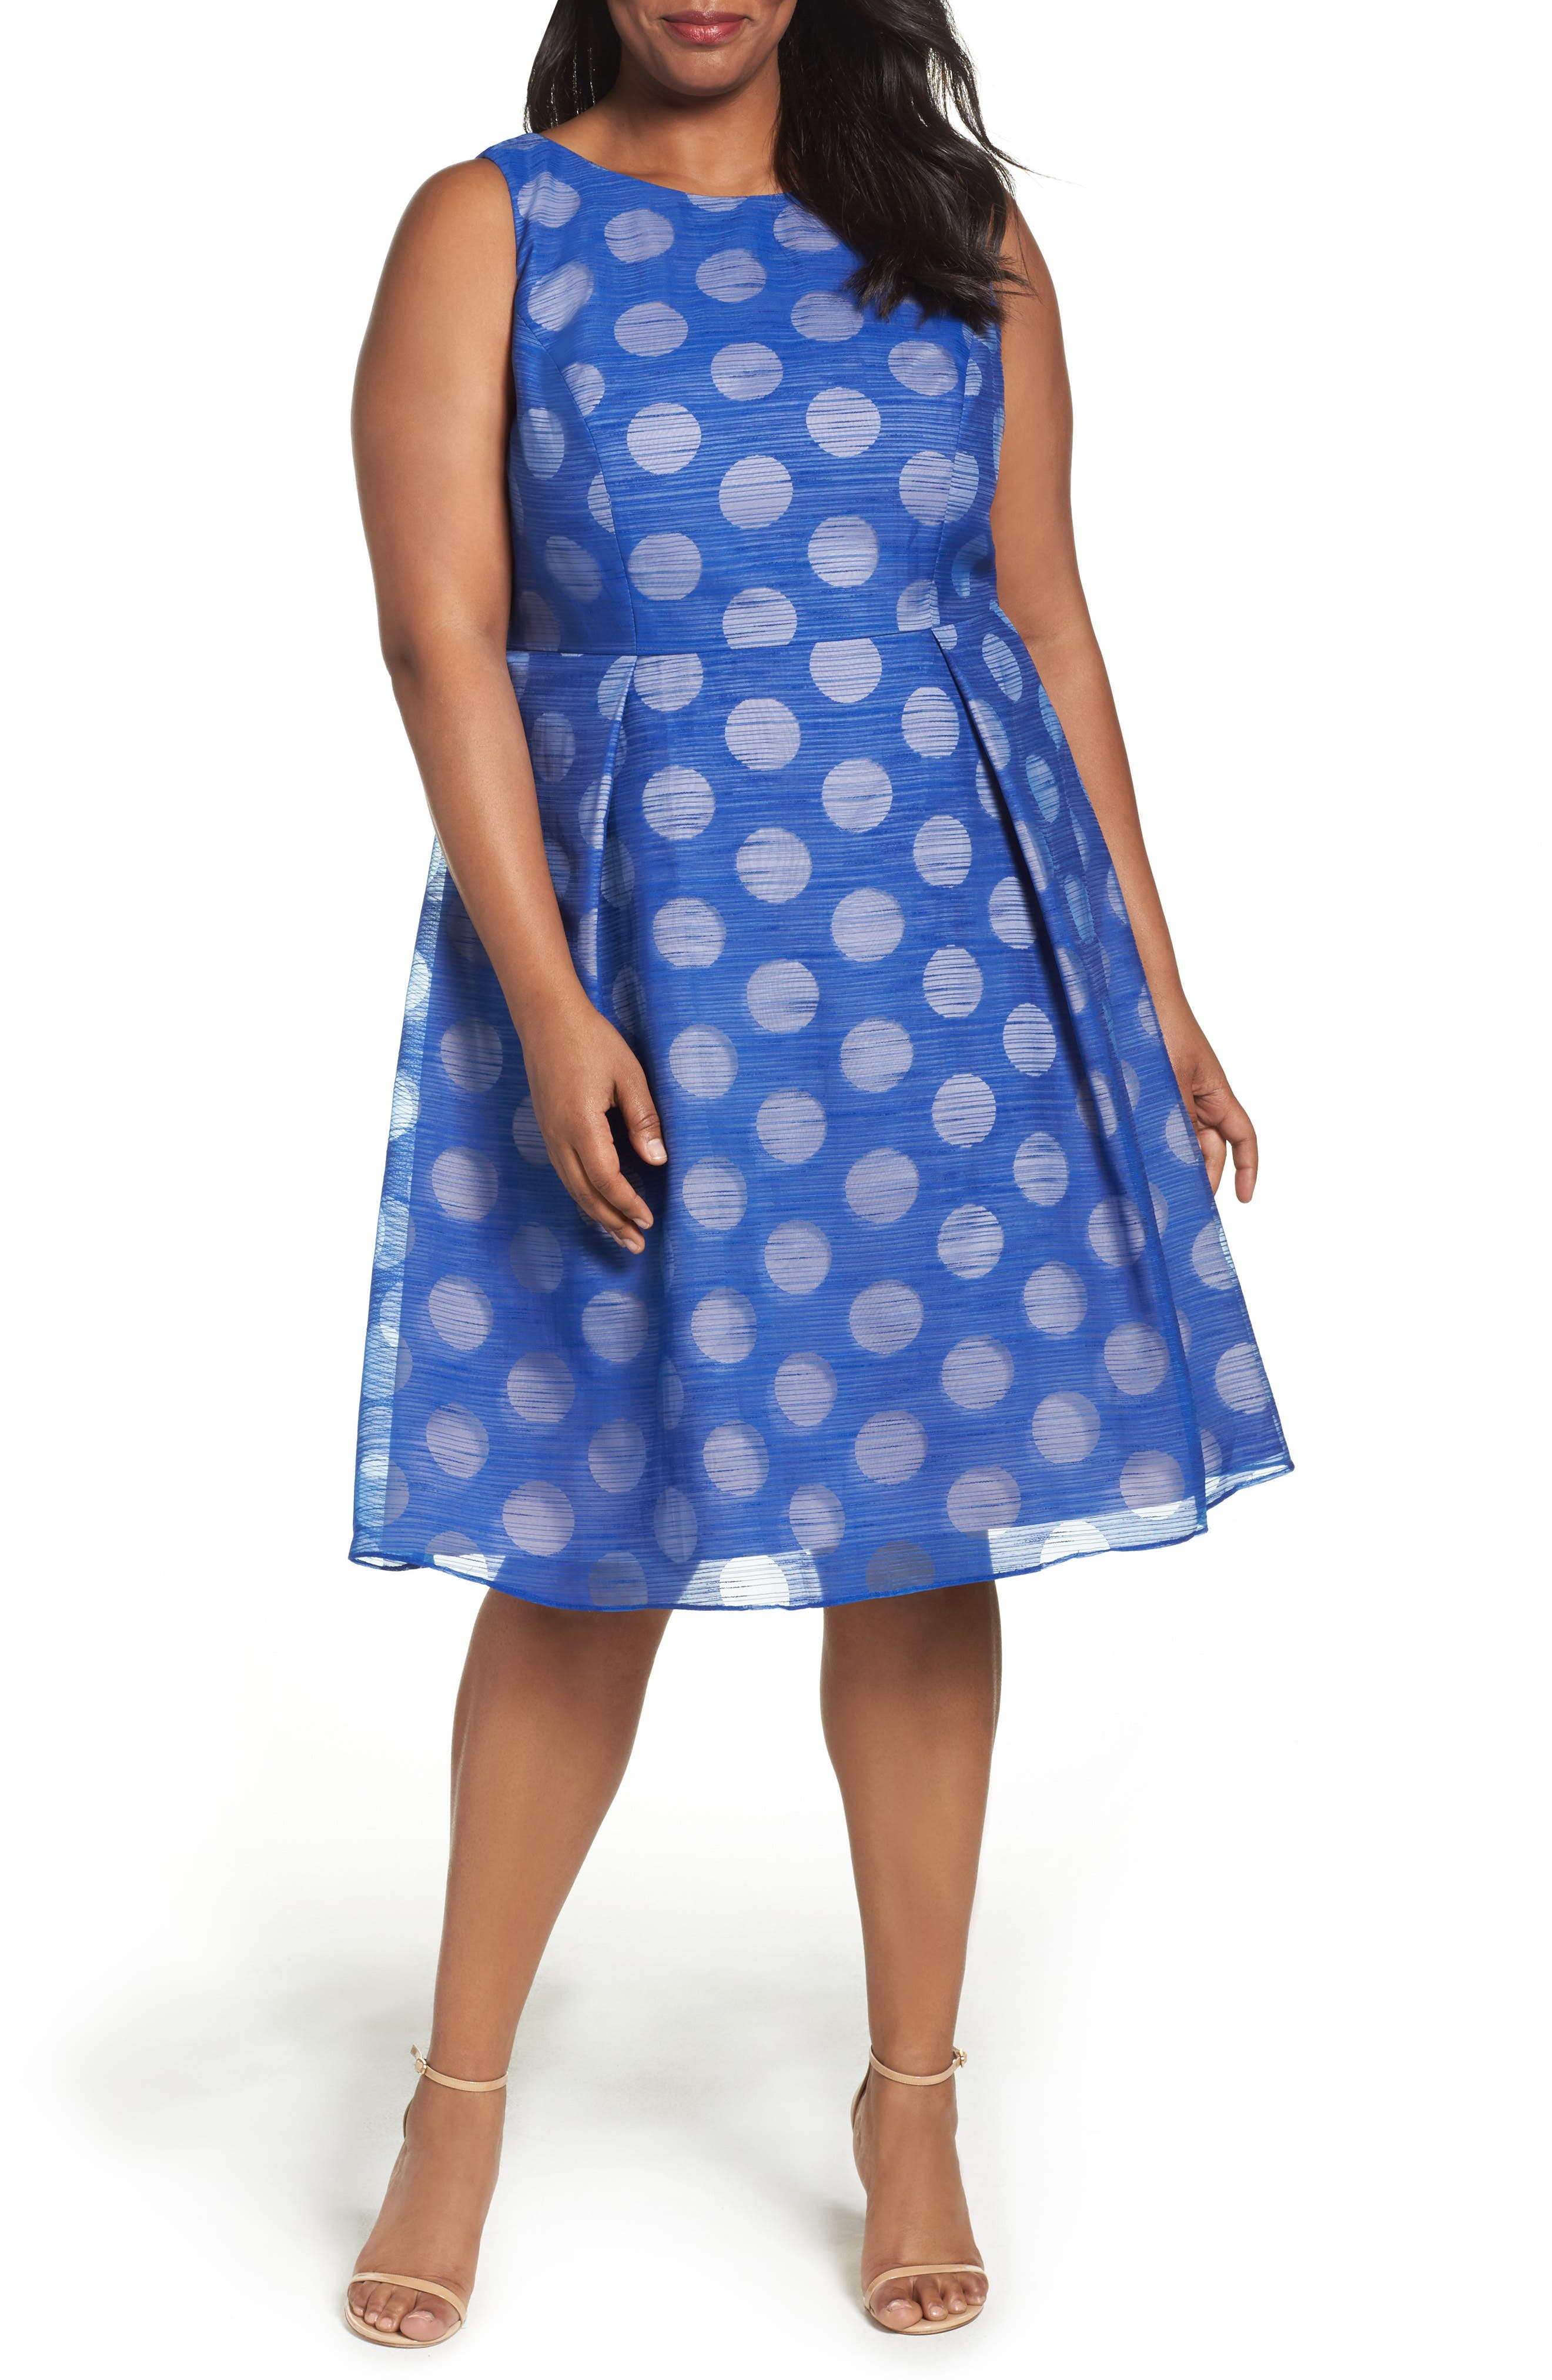 Main Image - Adrianna Papell Pop Dot Burnout Fit & Flare Dress (Plus Size)